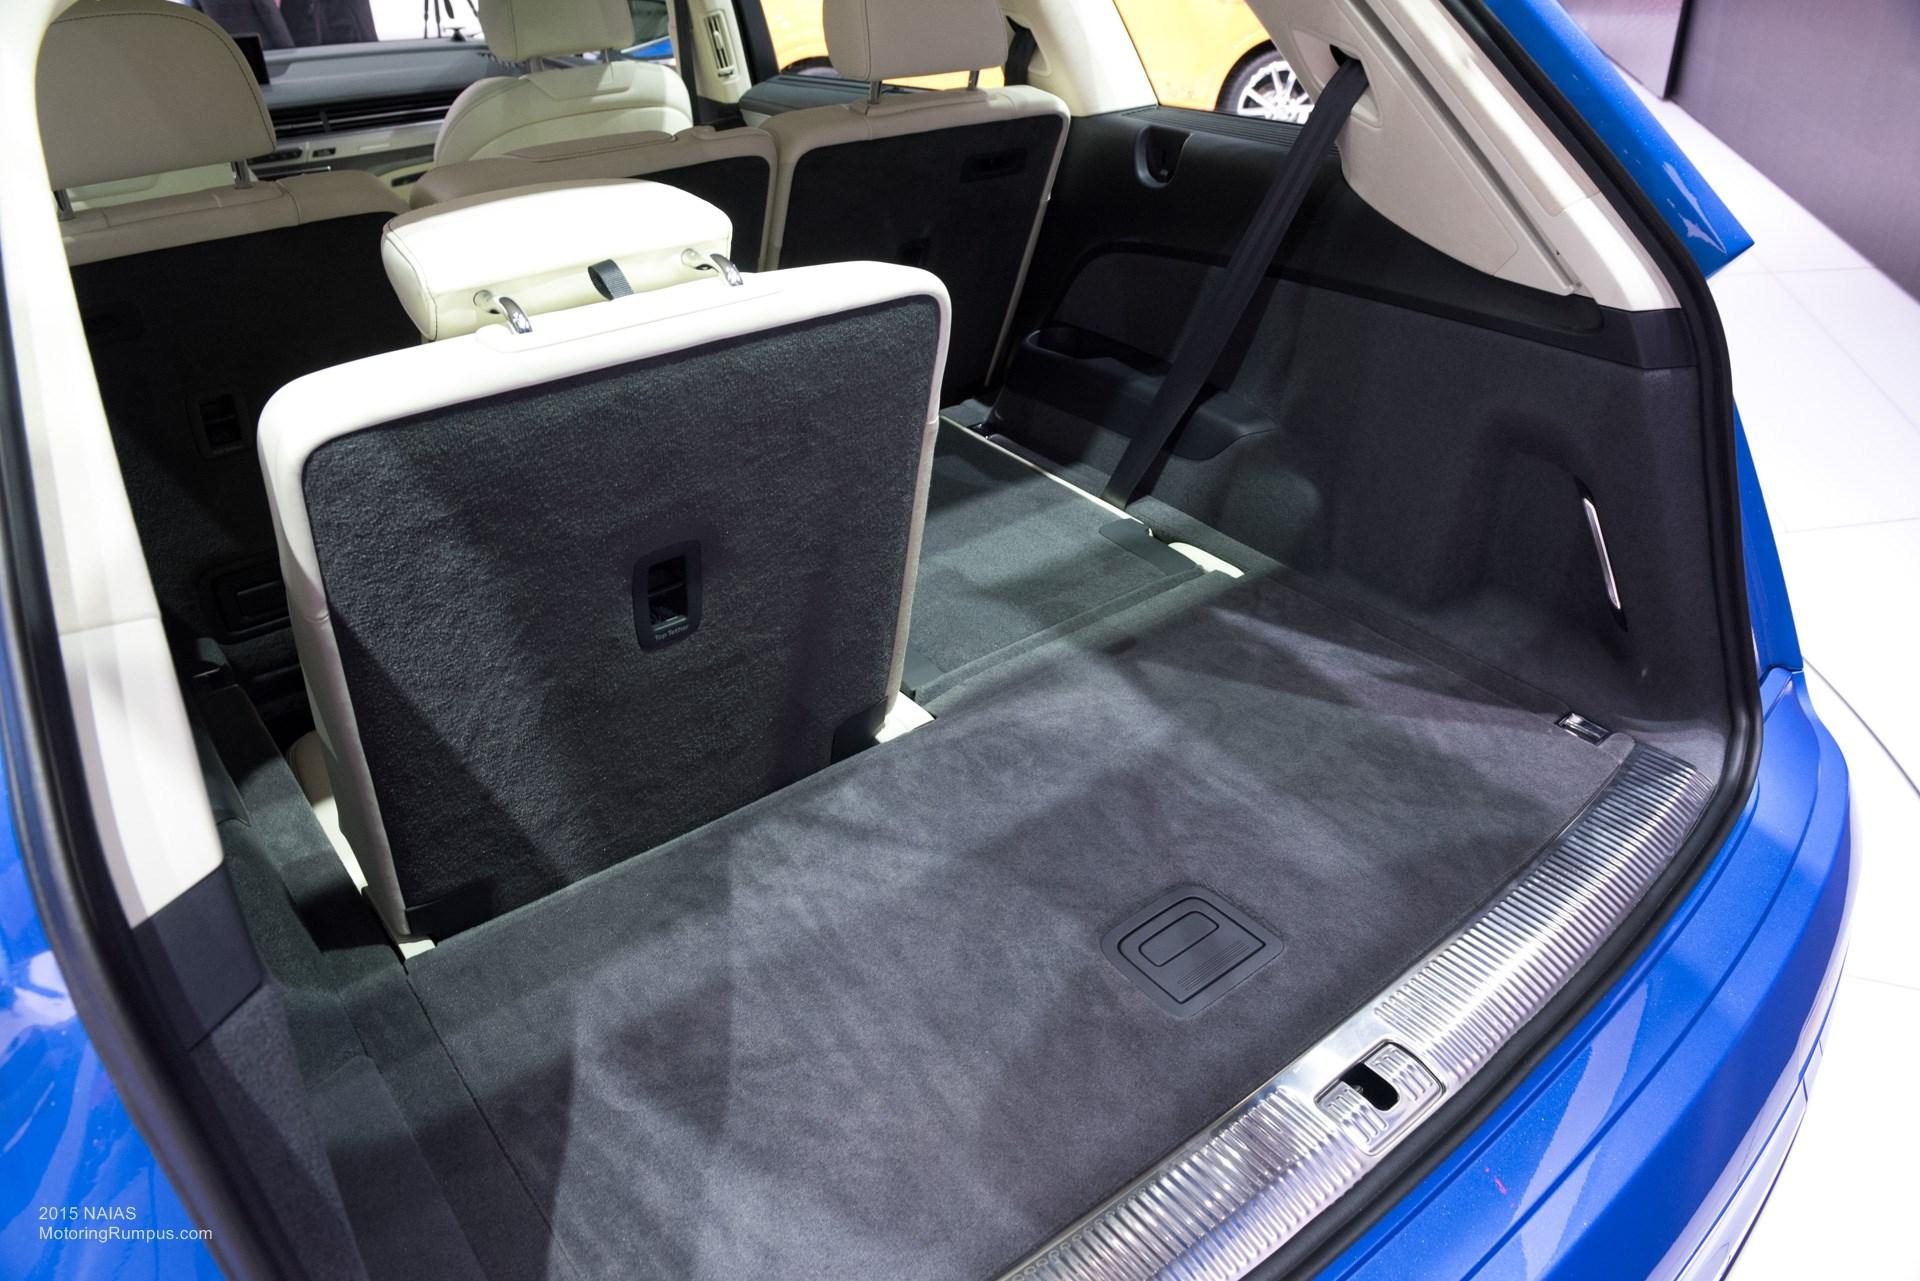 2015 NAIAS Audi Q7 Third Row Seats - Motoring Rumpus